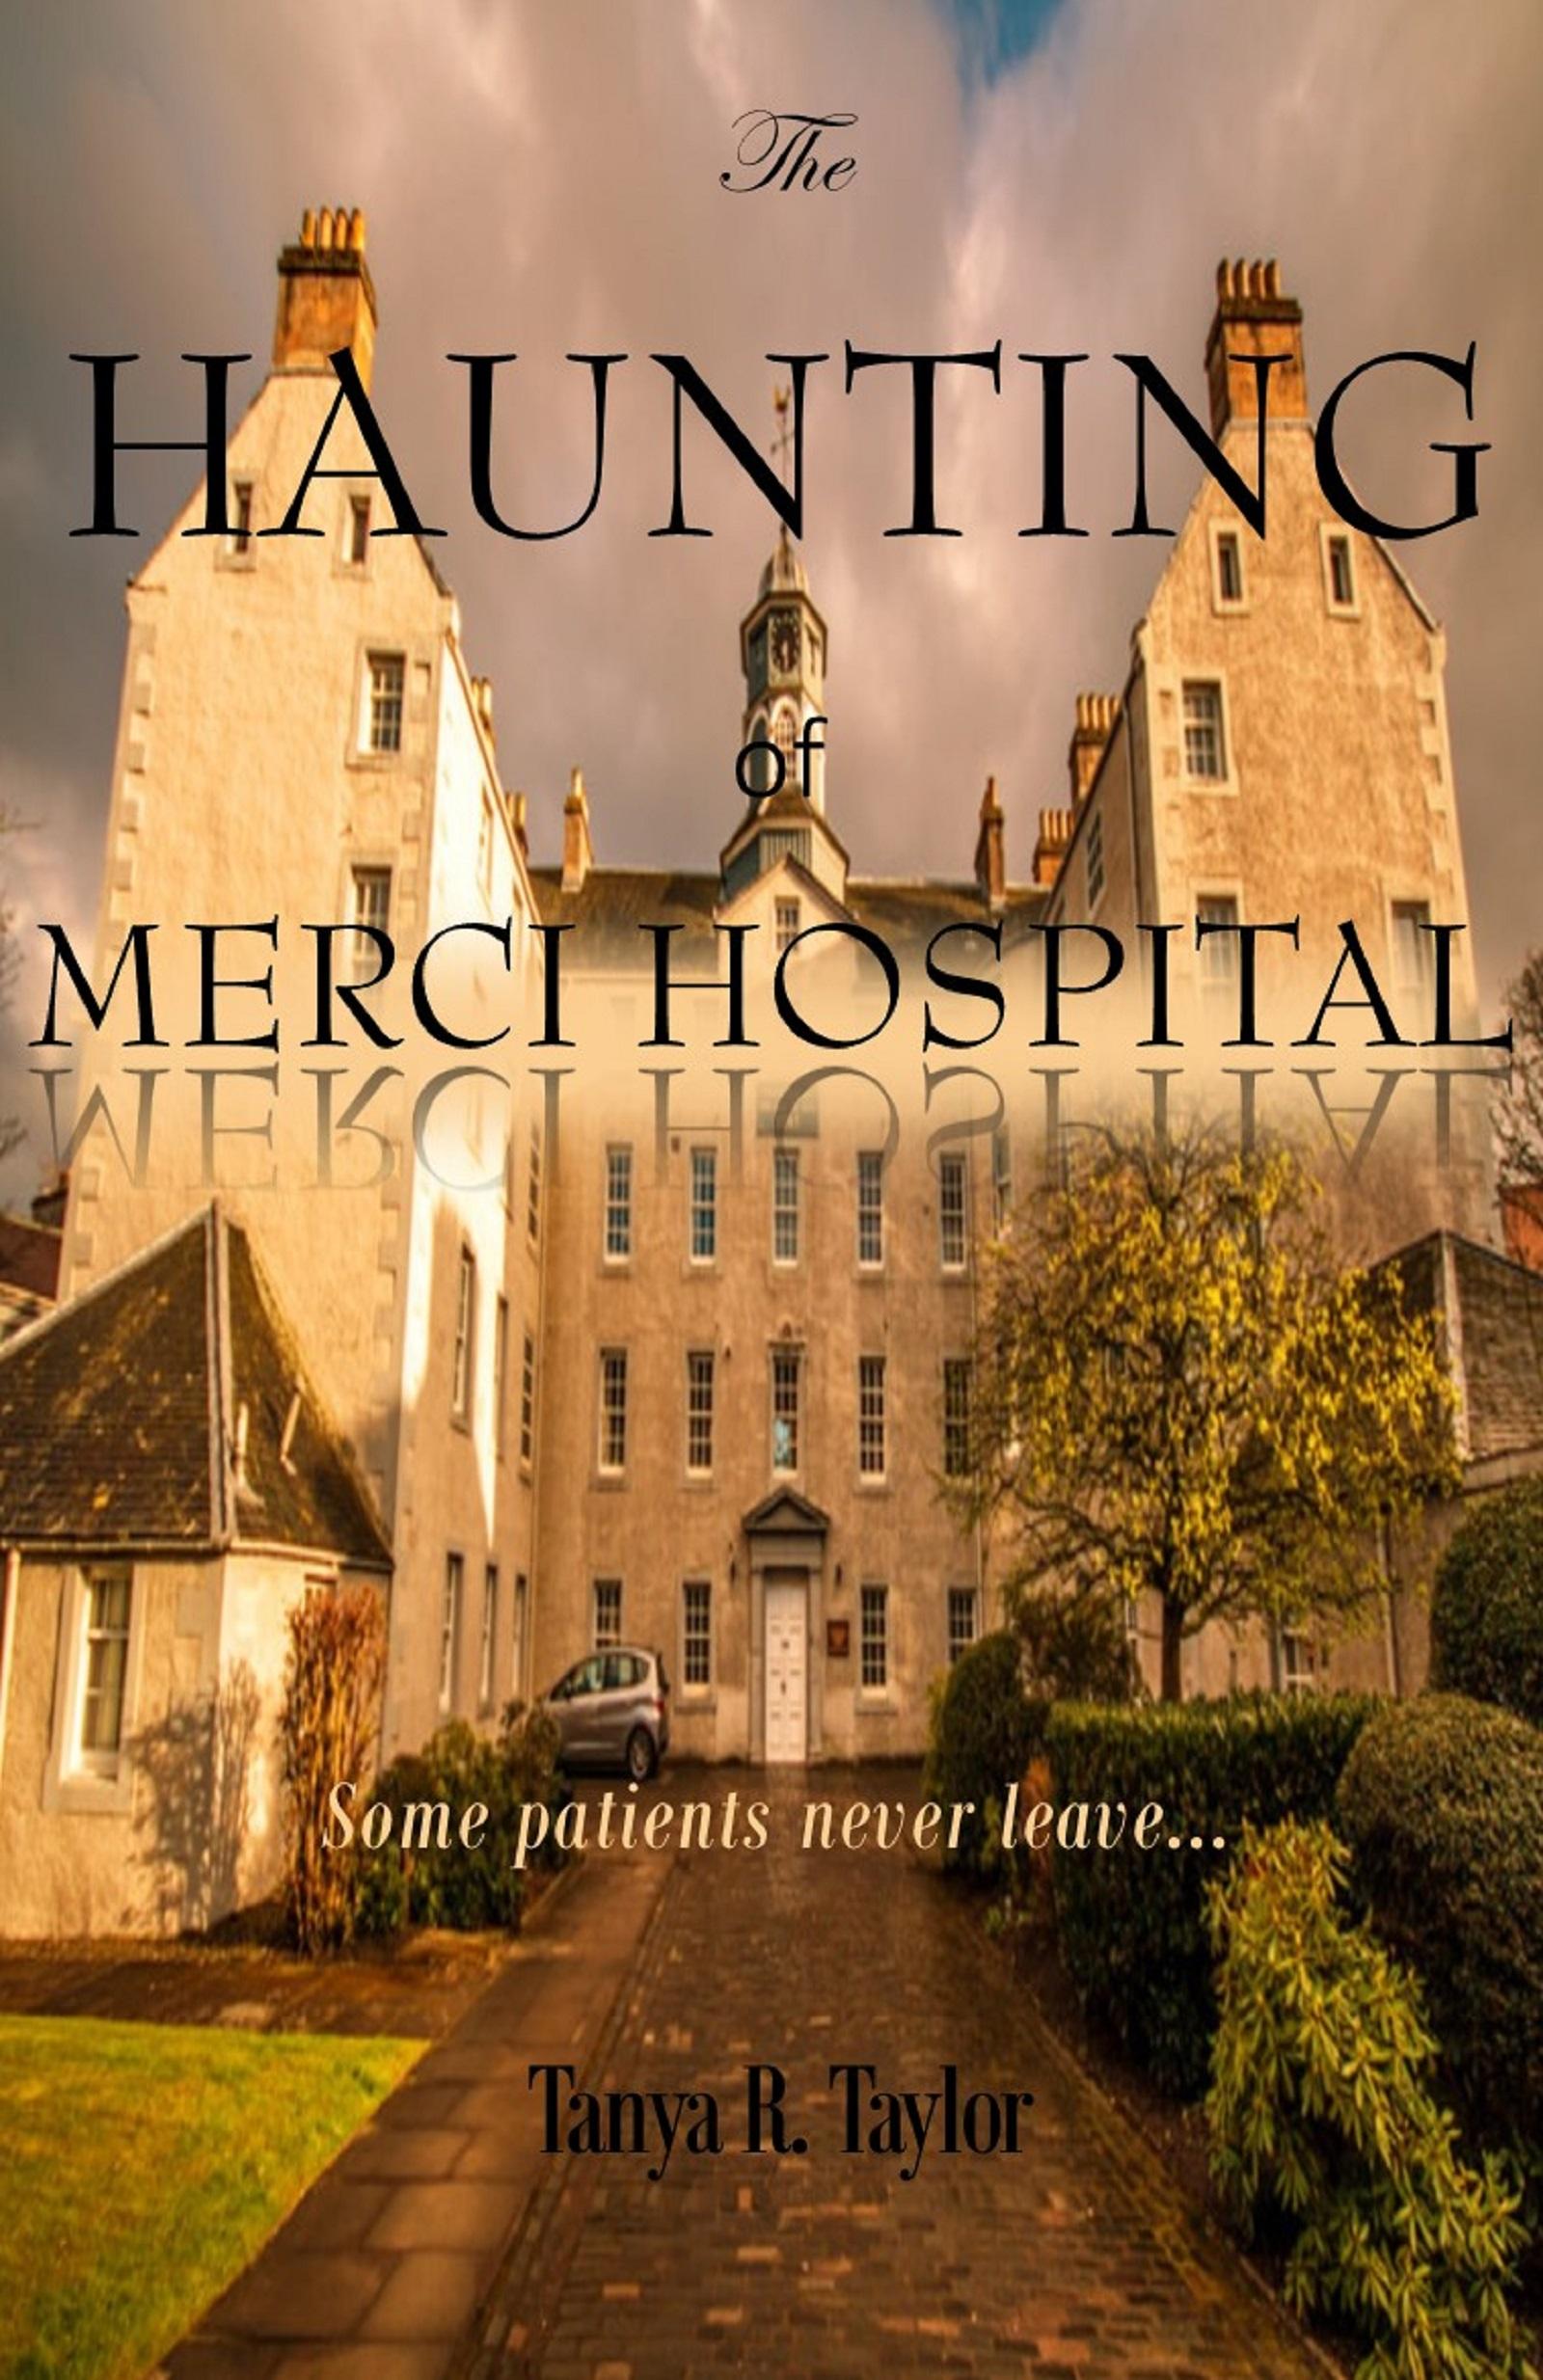 The HAUNTING OF MERCI HOSPITAL (LGR)